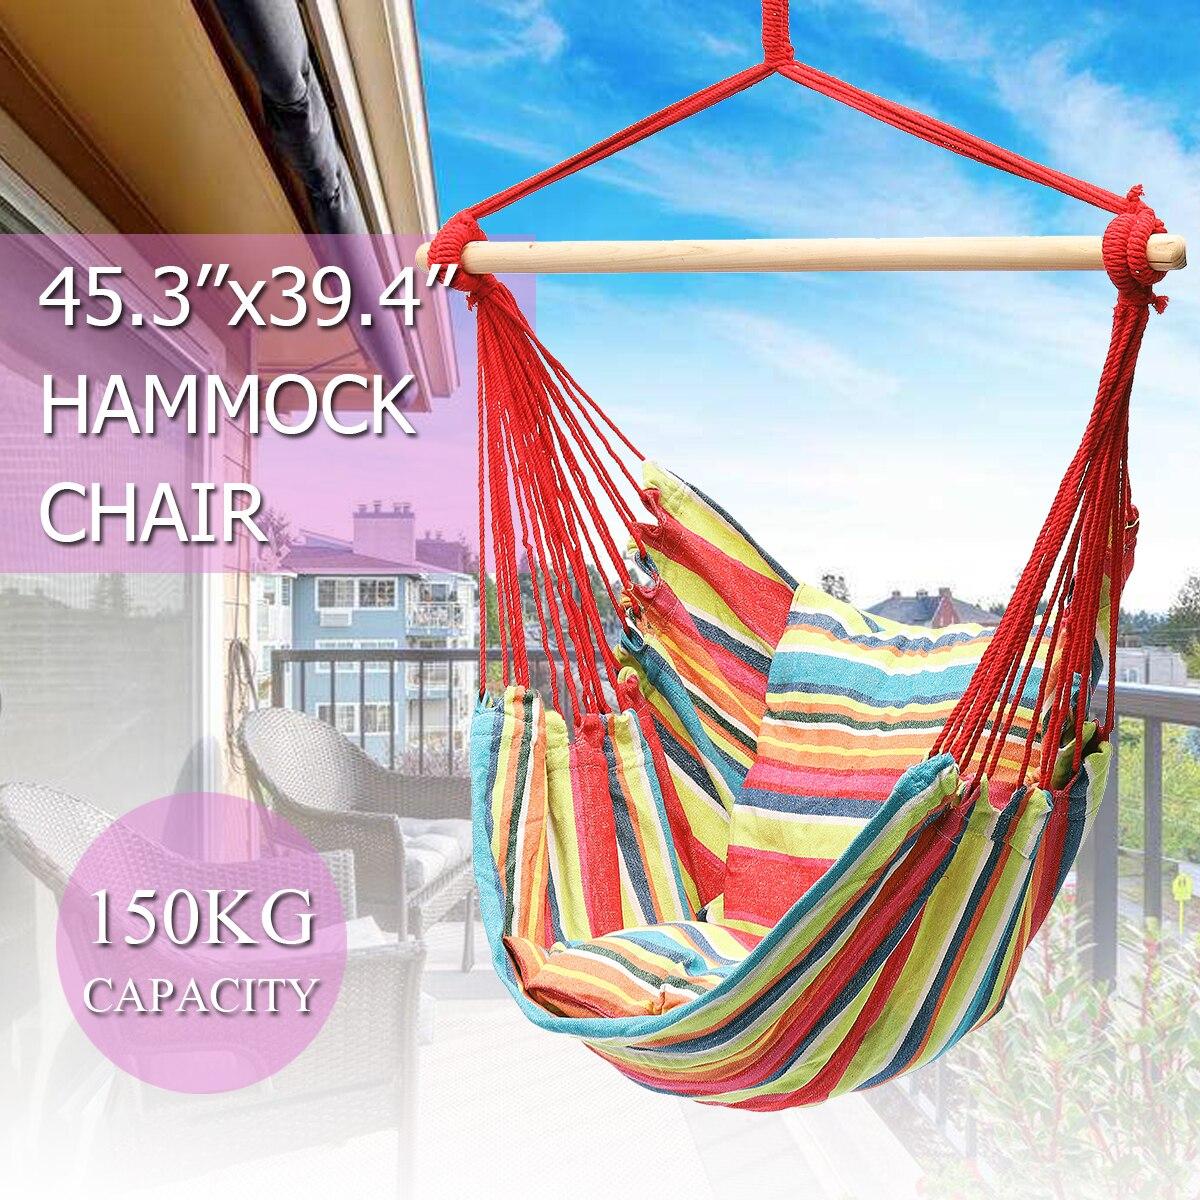 Indoor Outdoor Furniture Canvas Hammocks Chair Fashion Hanging Swinging Chair Dormitory Garden Swing + 2 Pillows Hammock Camping modern hammocks outdoor hammock chair